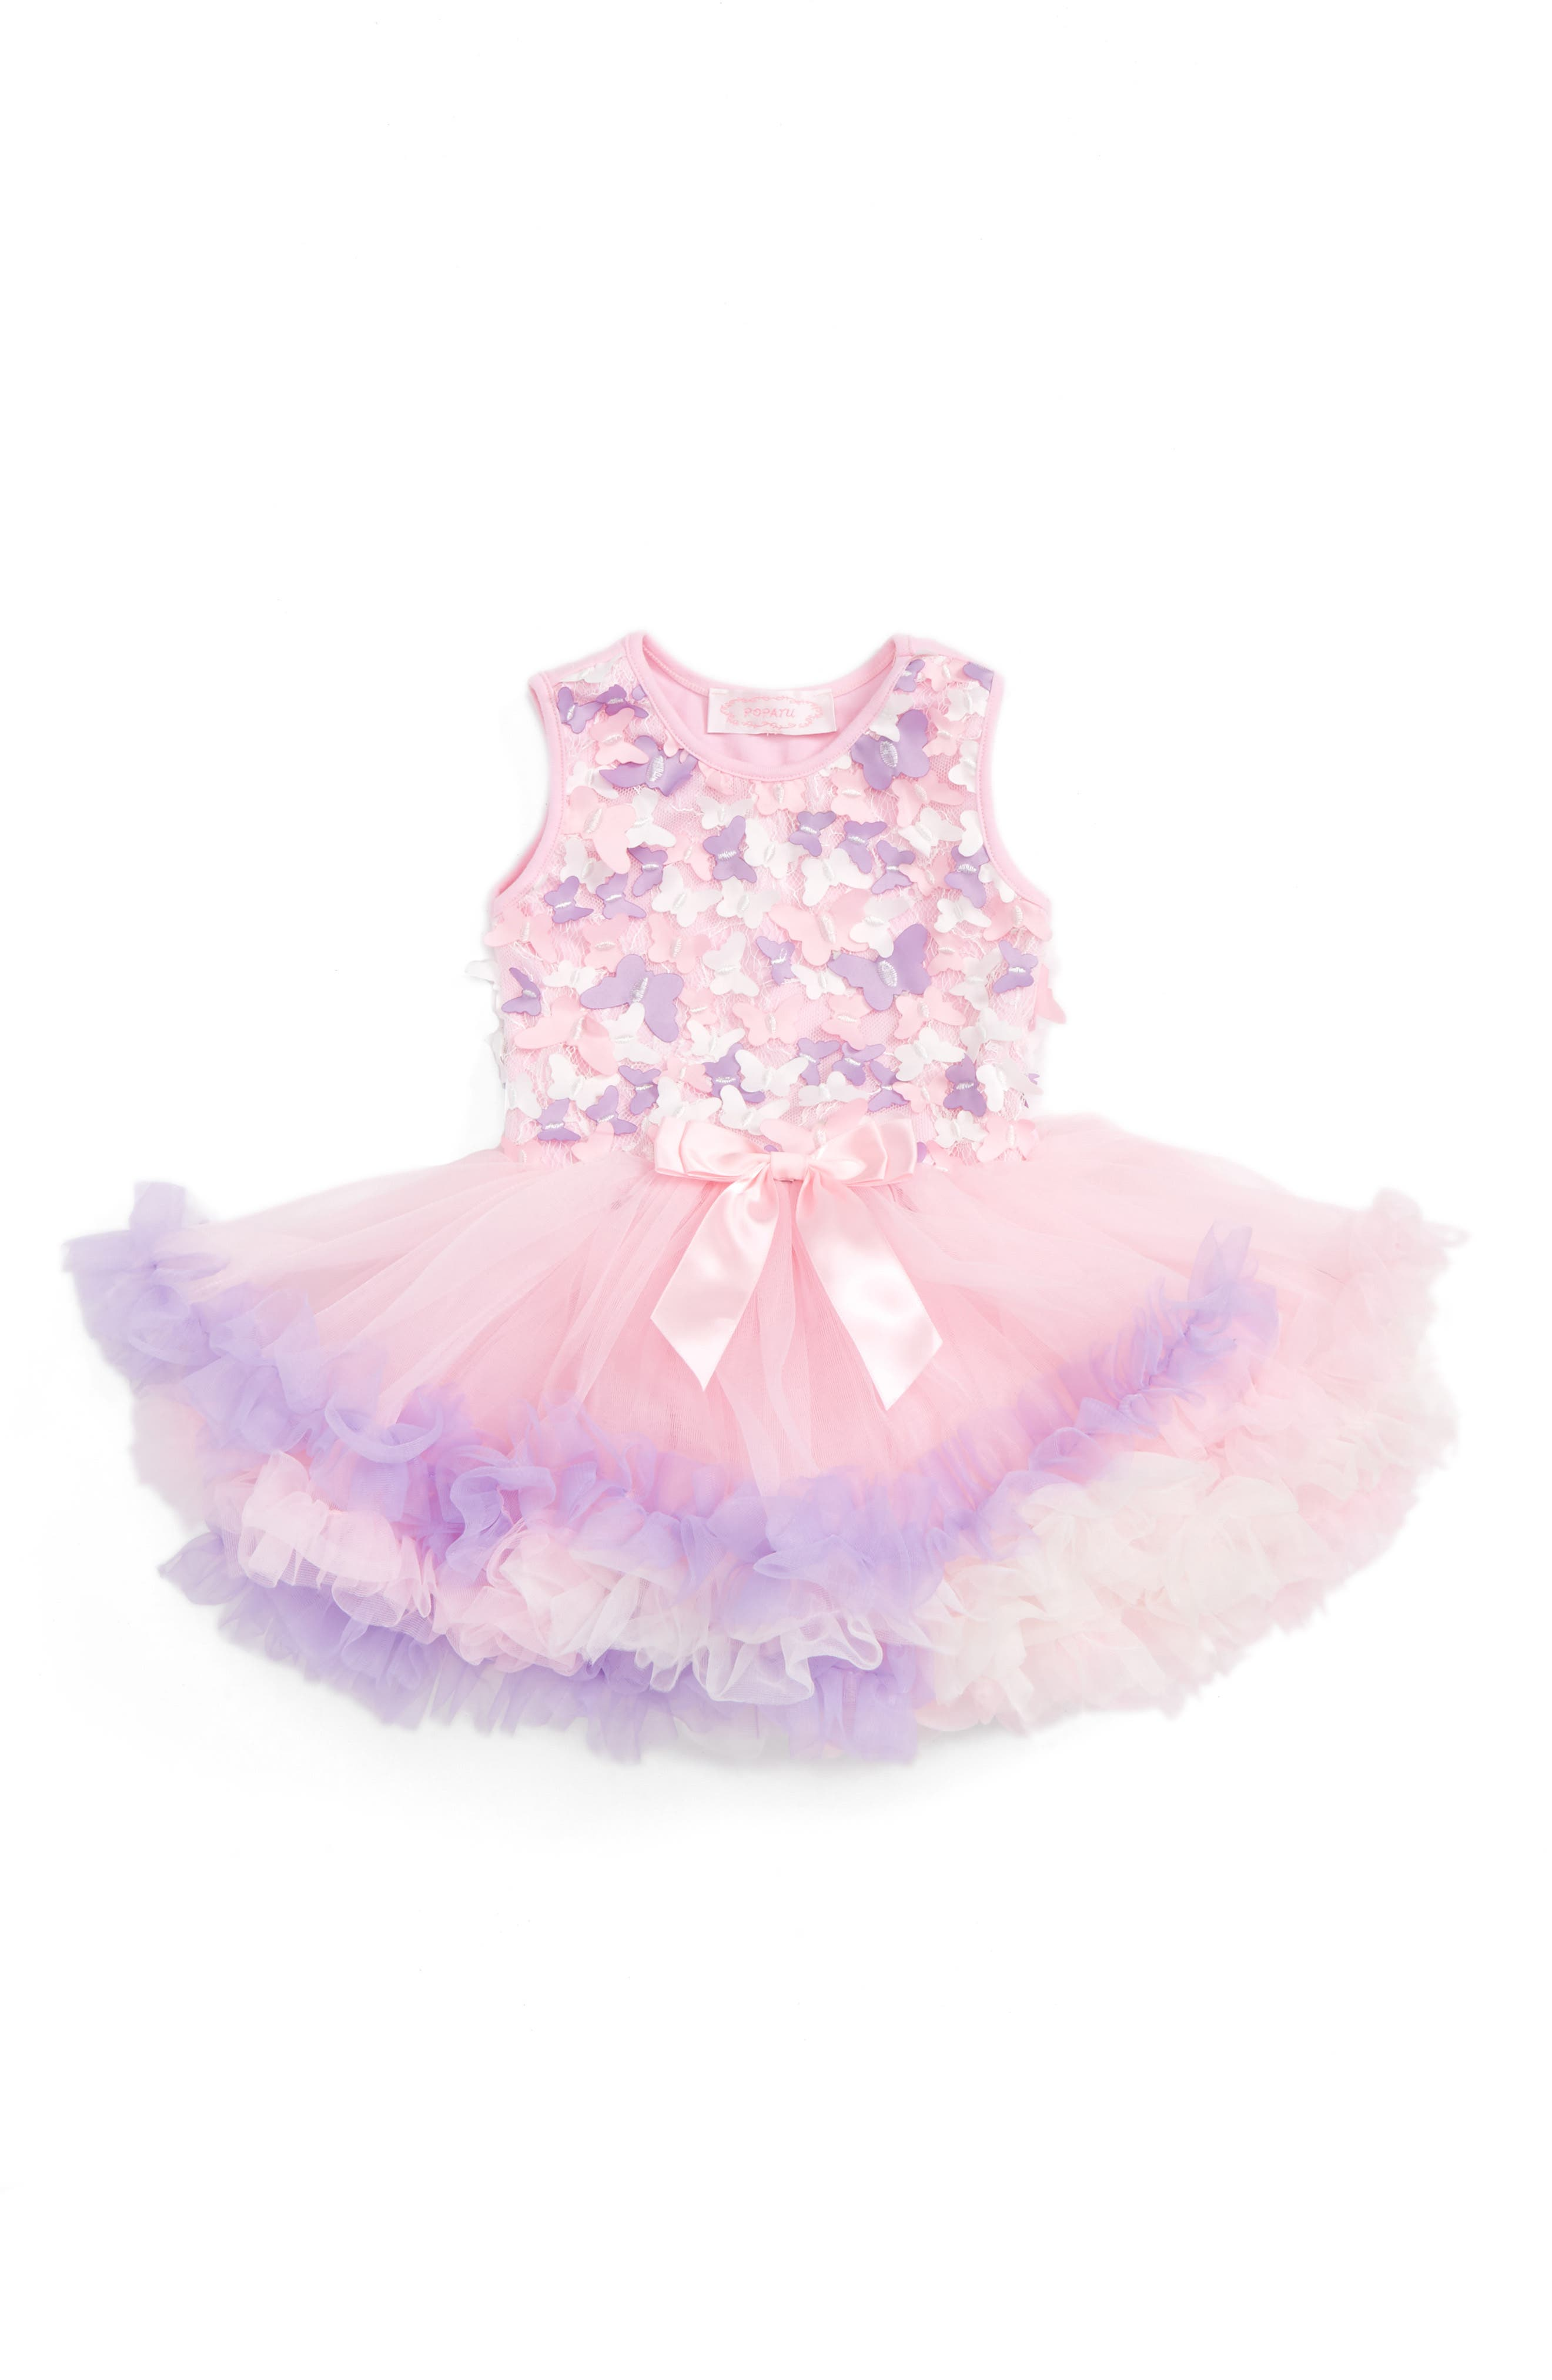 Butterfly Tutu Dress,                         Main,                         color, PINK/ PURPLE